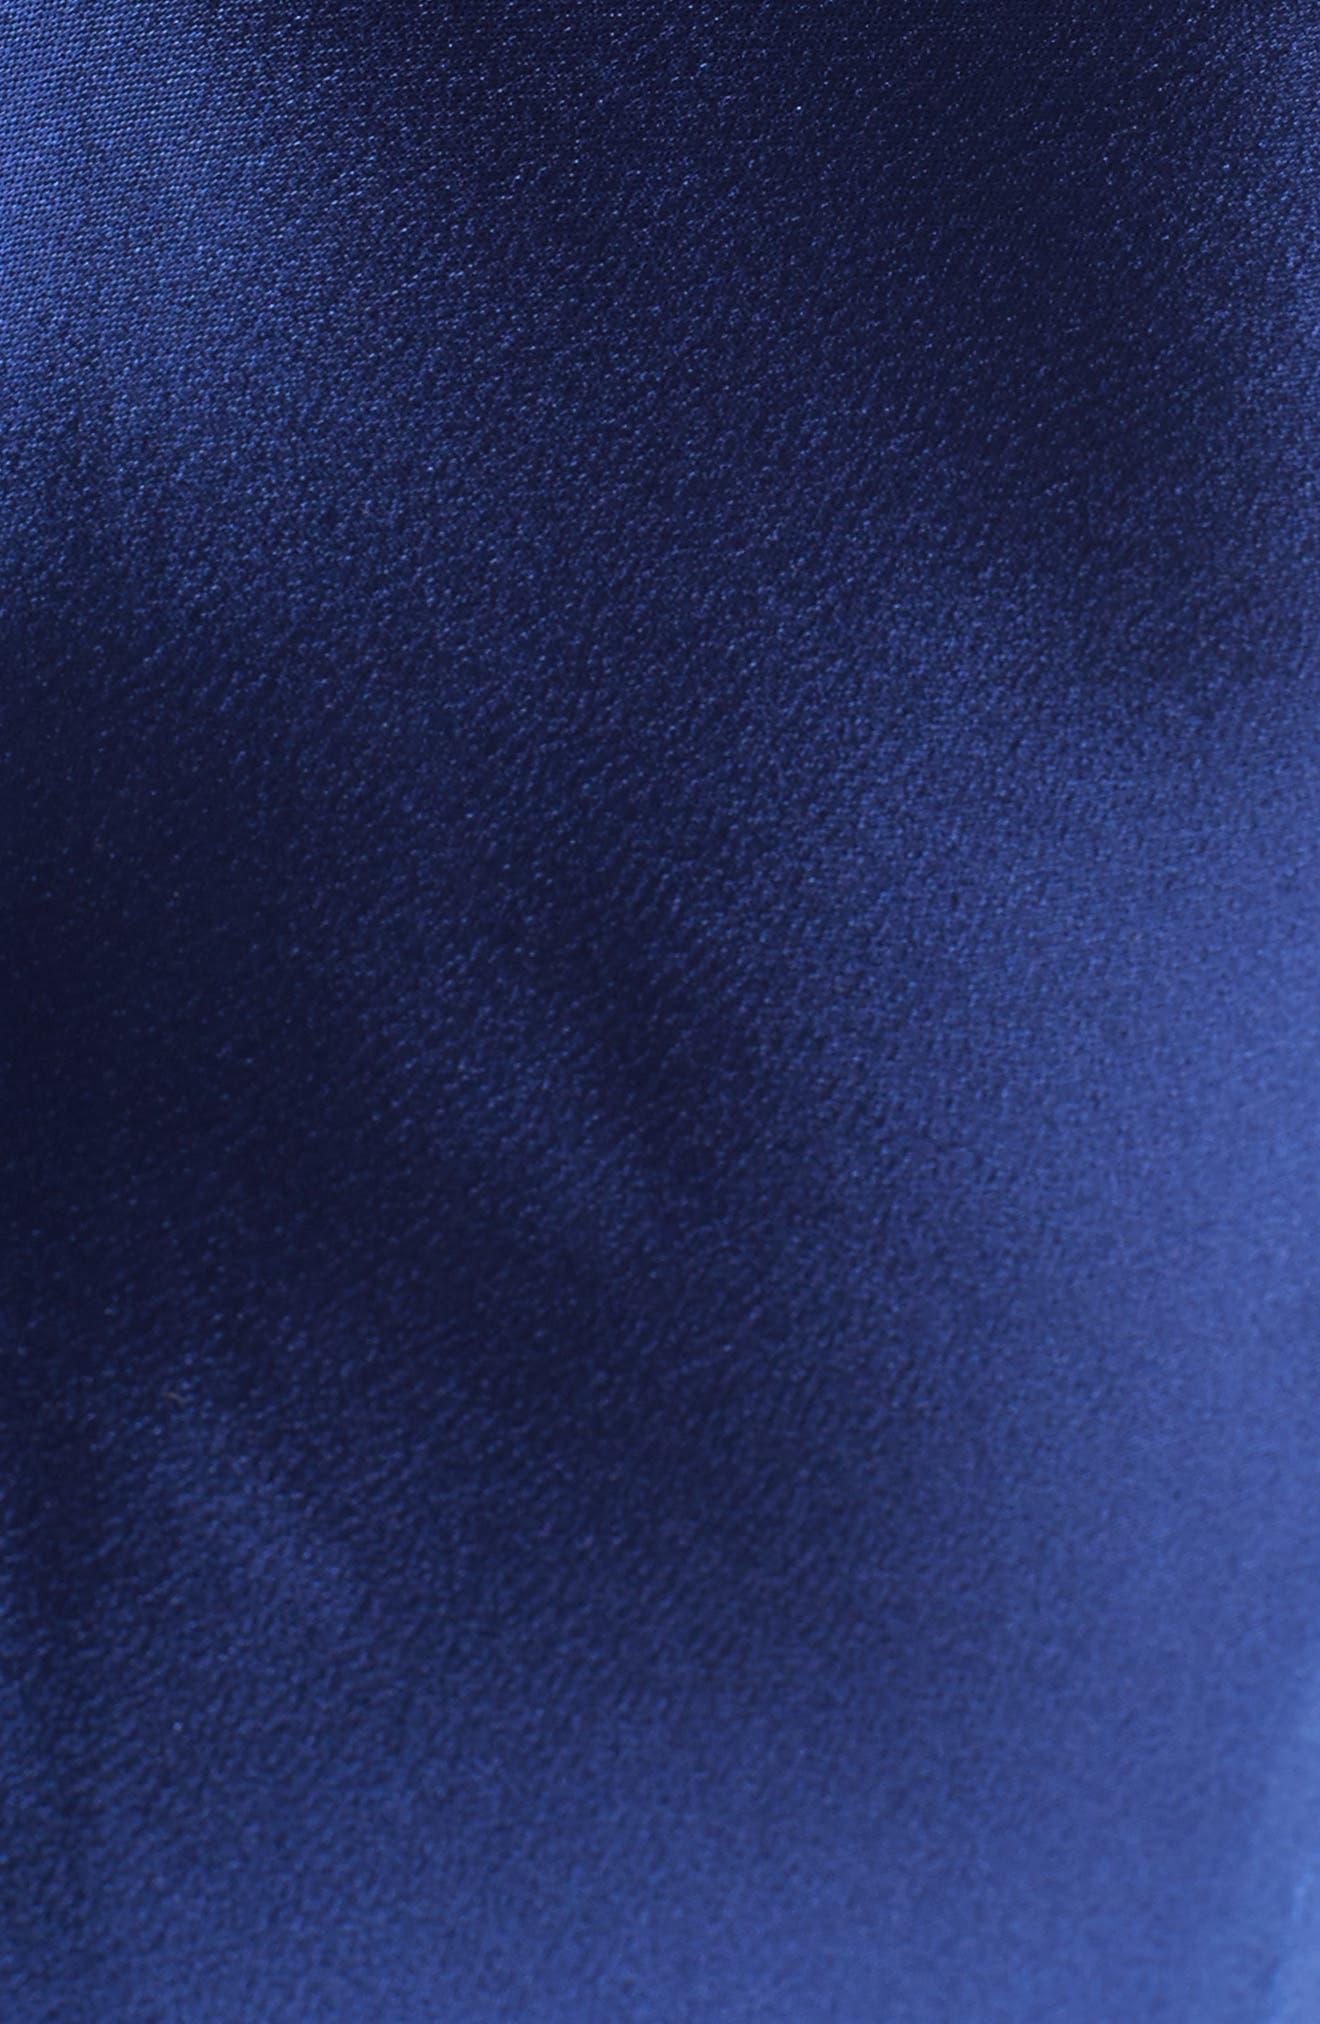 Bow Detail Crepe Satin Gown,                             Alternate thumbnail 6, color,